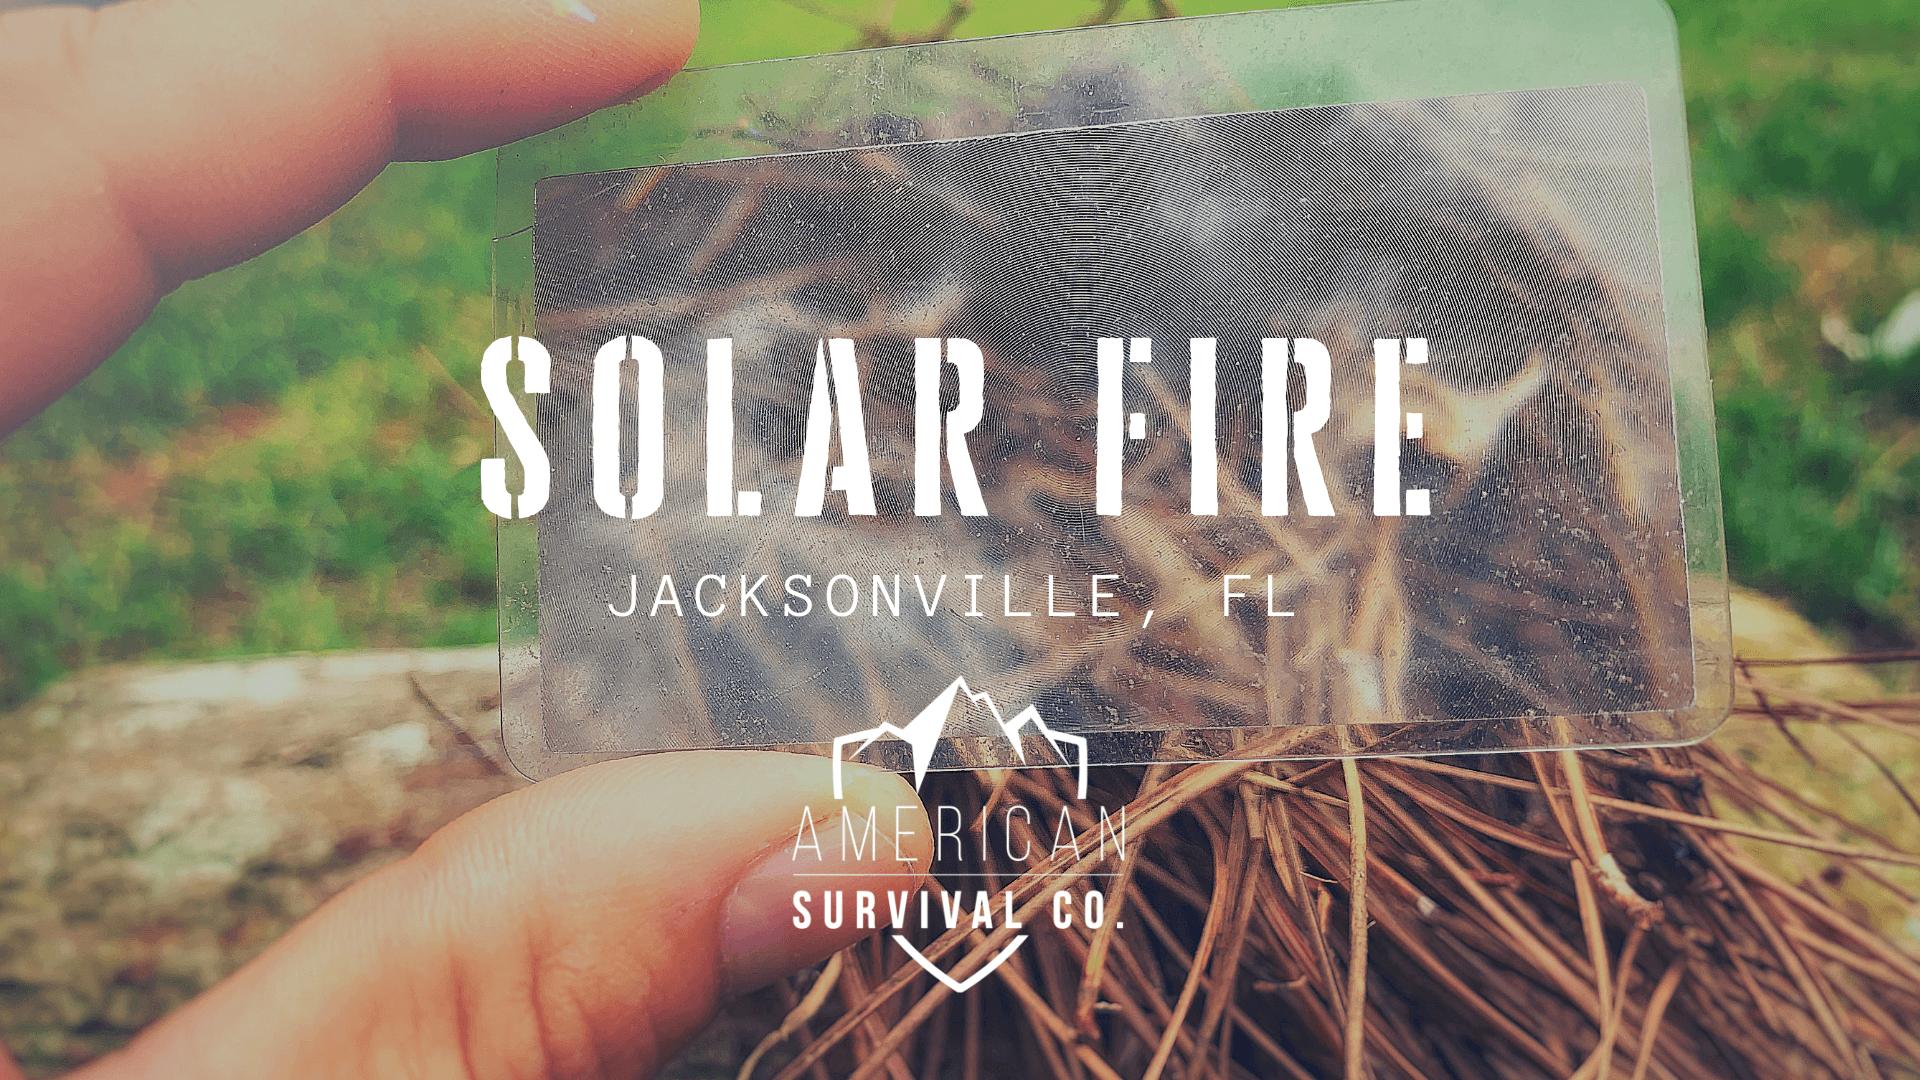 solar fire workshop